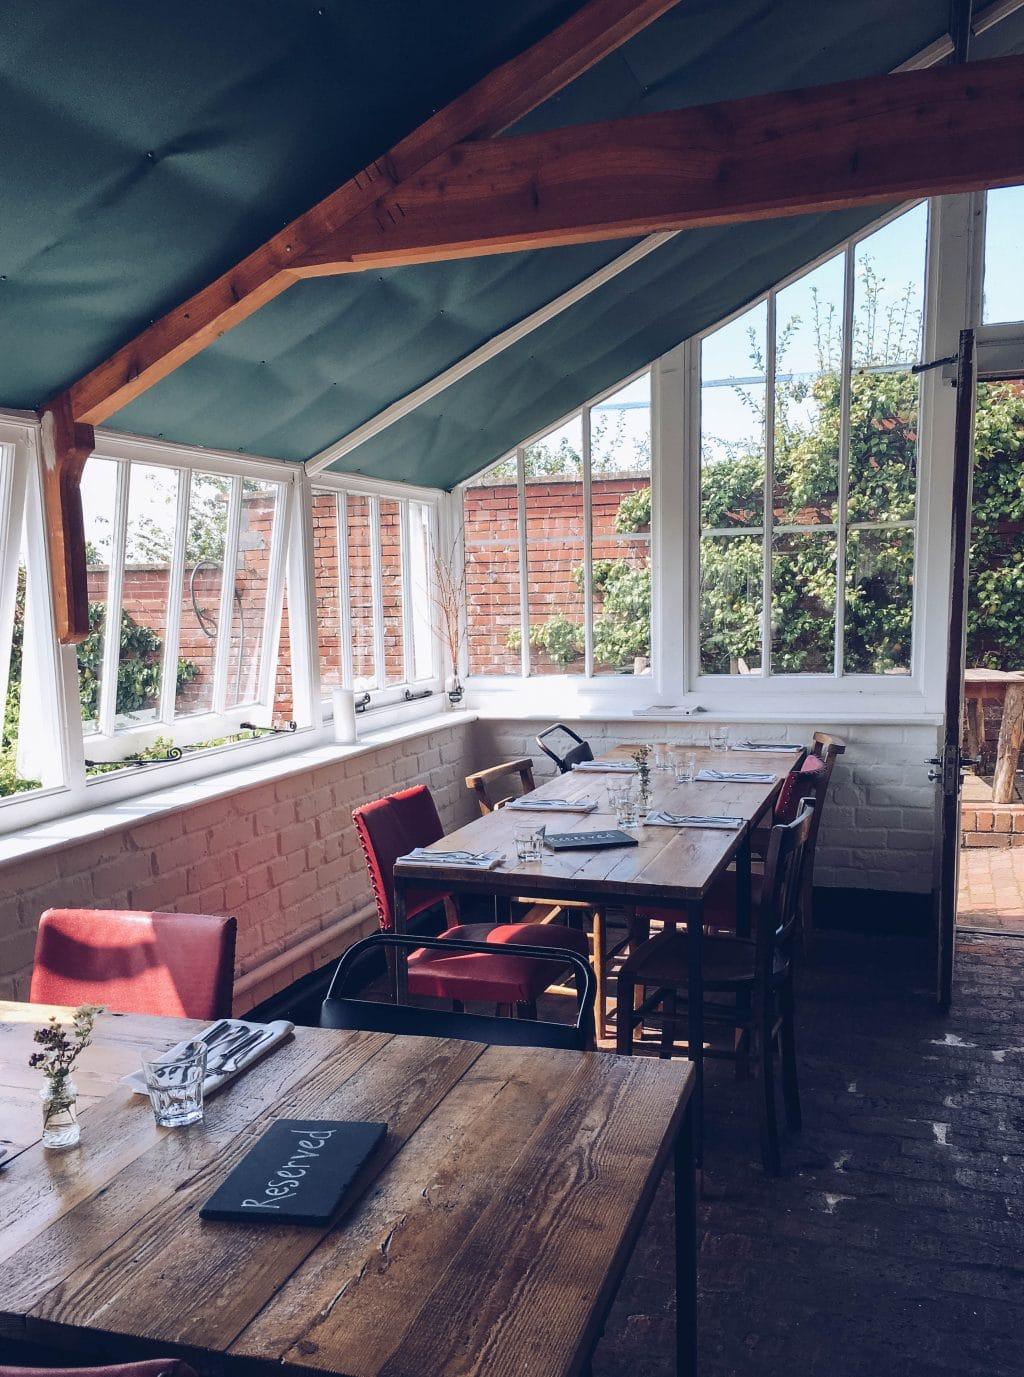 Restaurant at The Ethicurean, Bristol